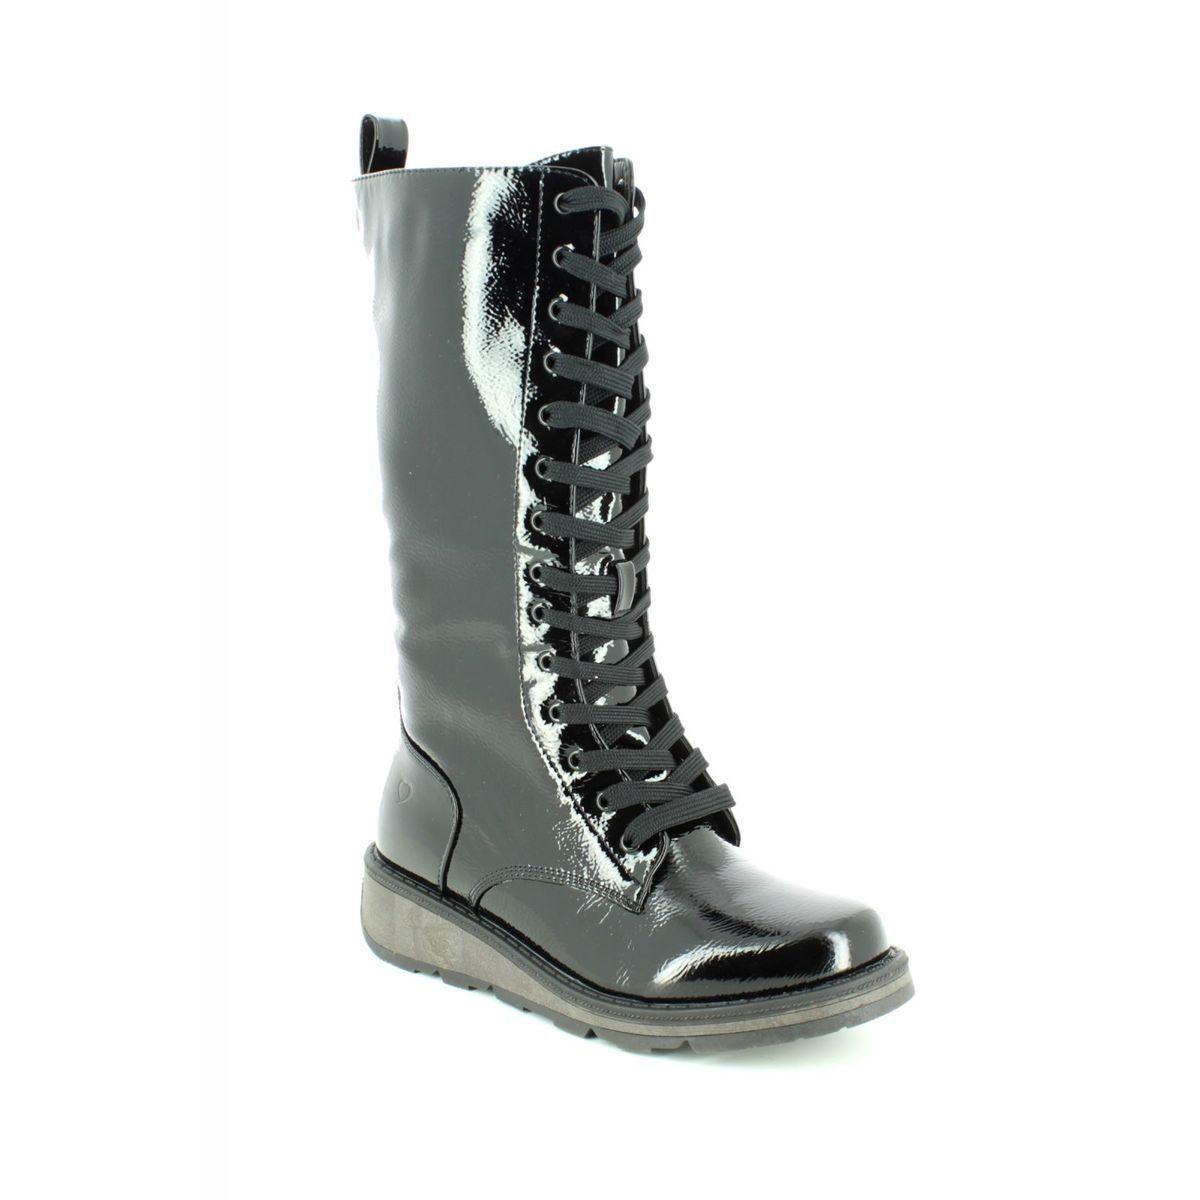 2a36033c Heavenly Feet Knee-high Boots - Black patent - 8521/40 MAZE